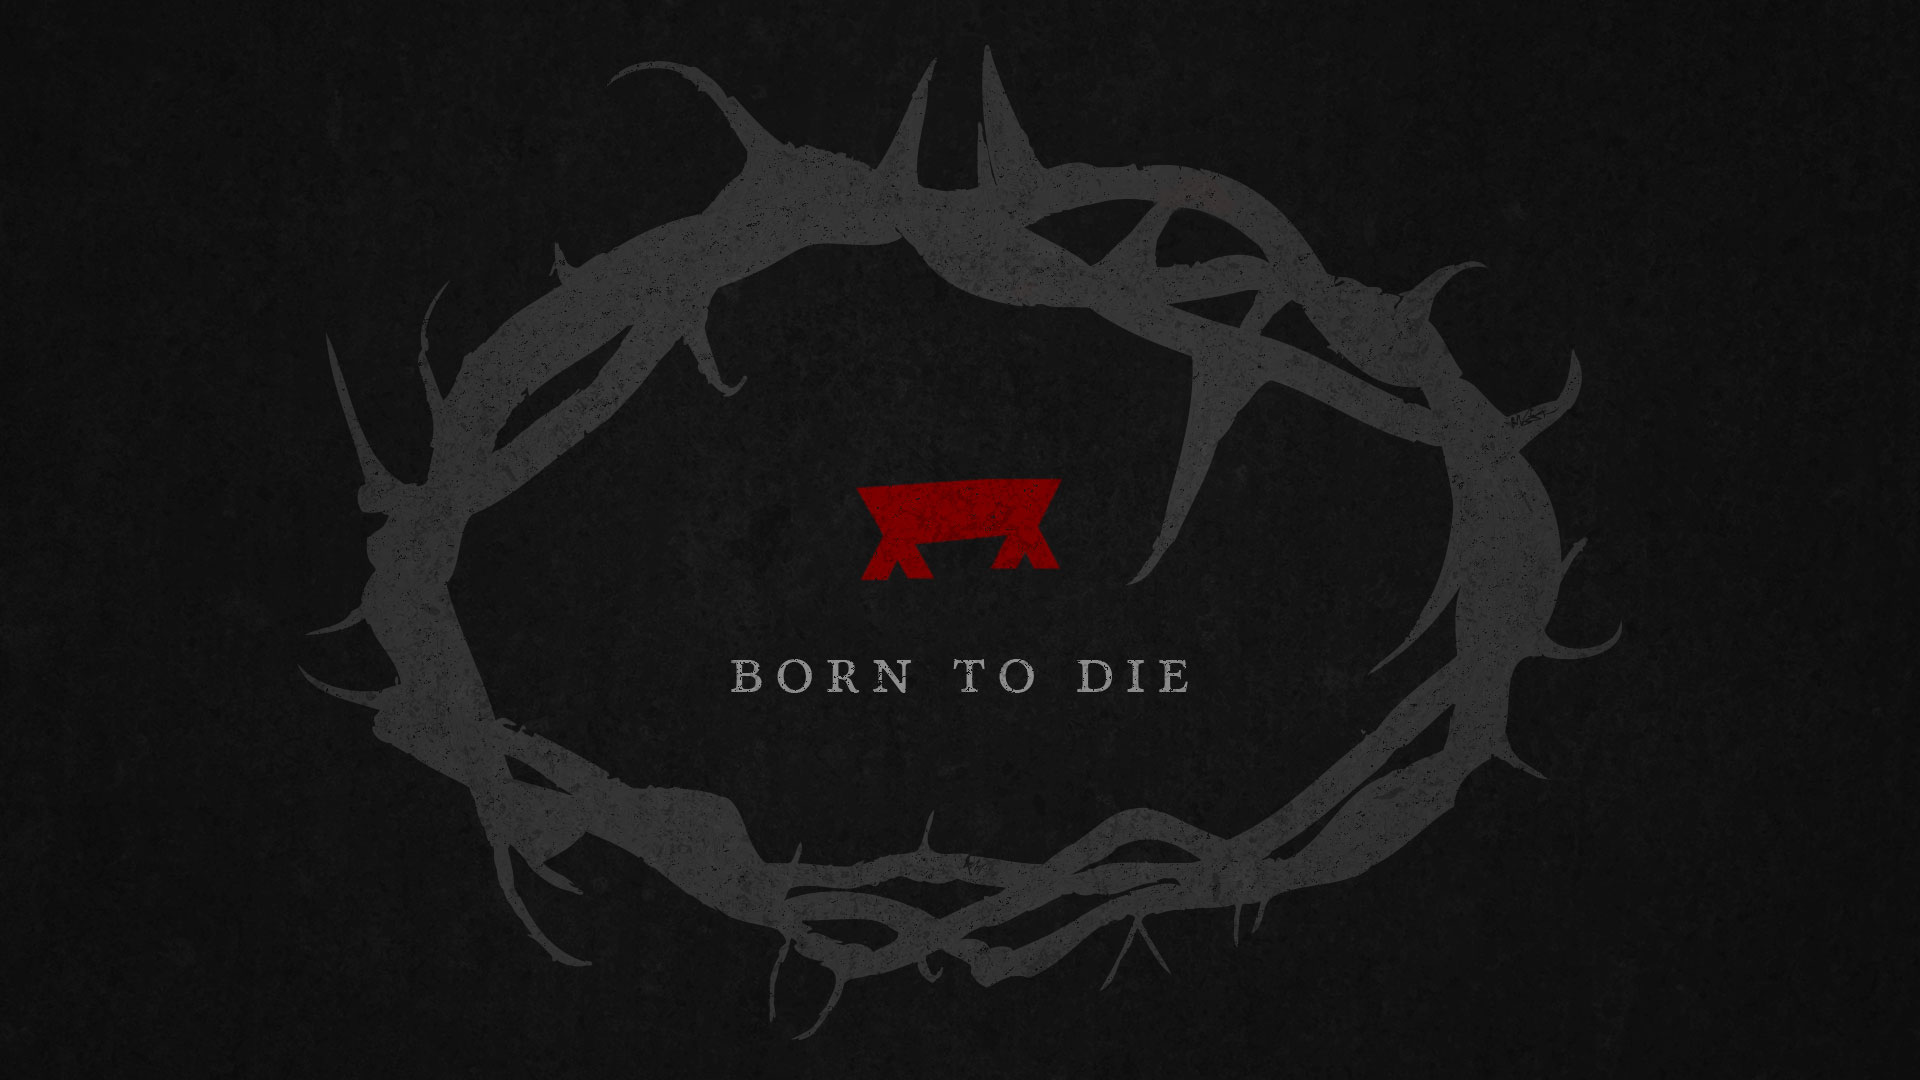 Born-to-Die_16x9_widescreen.jpg